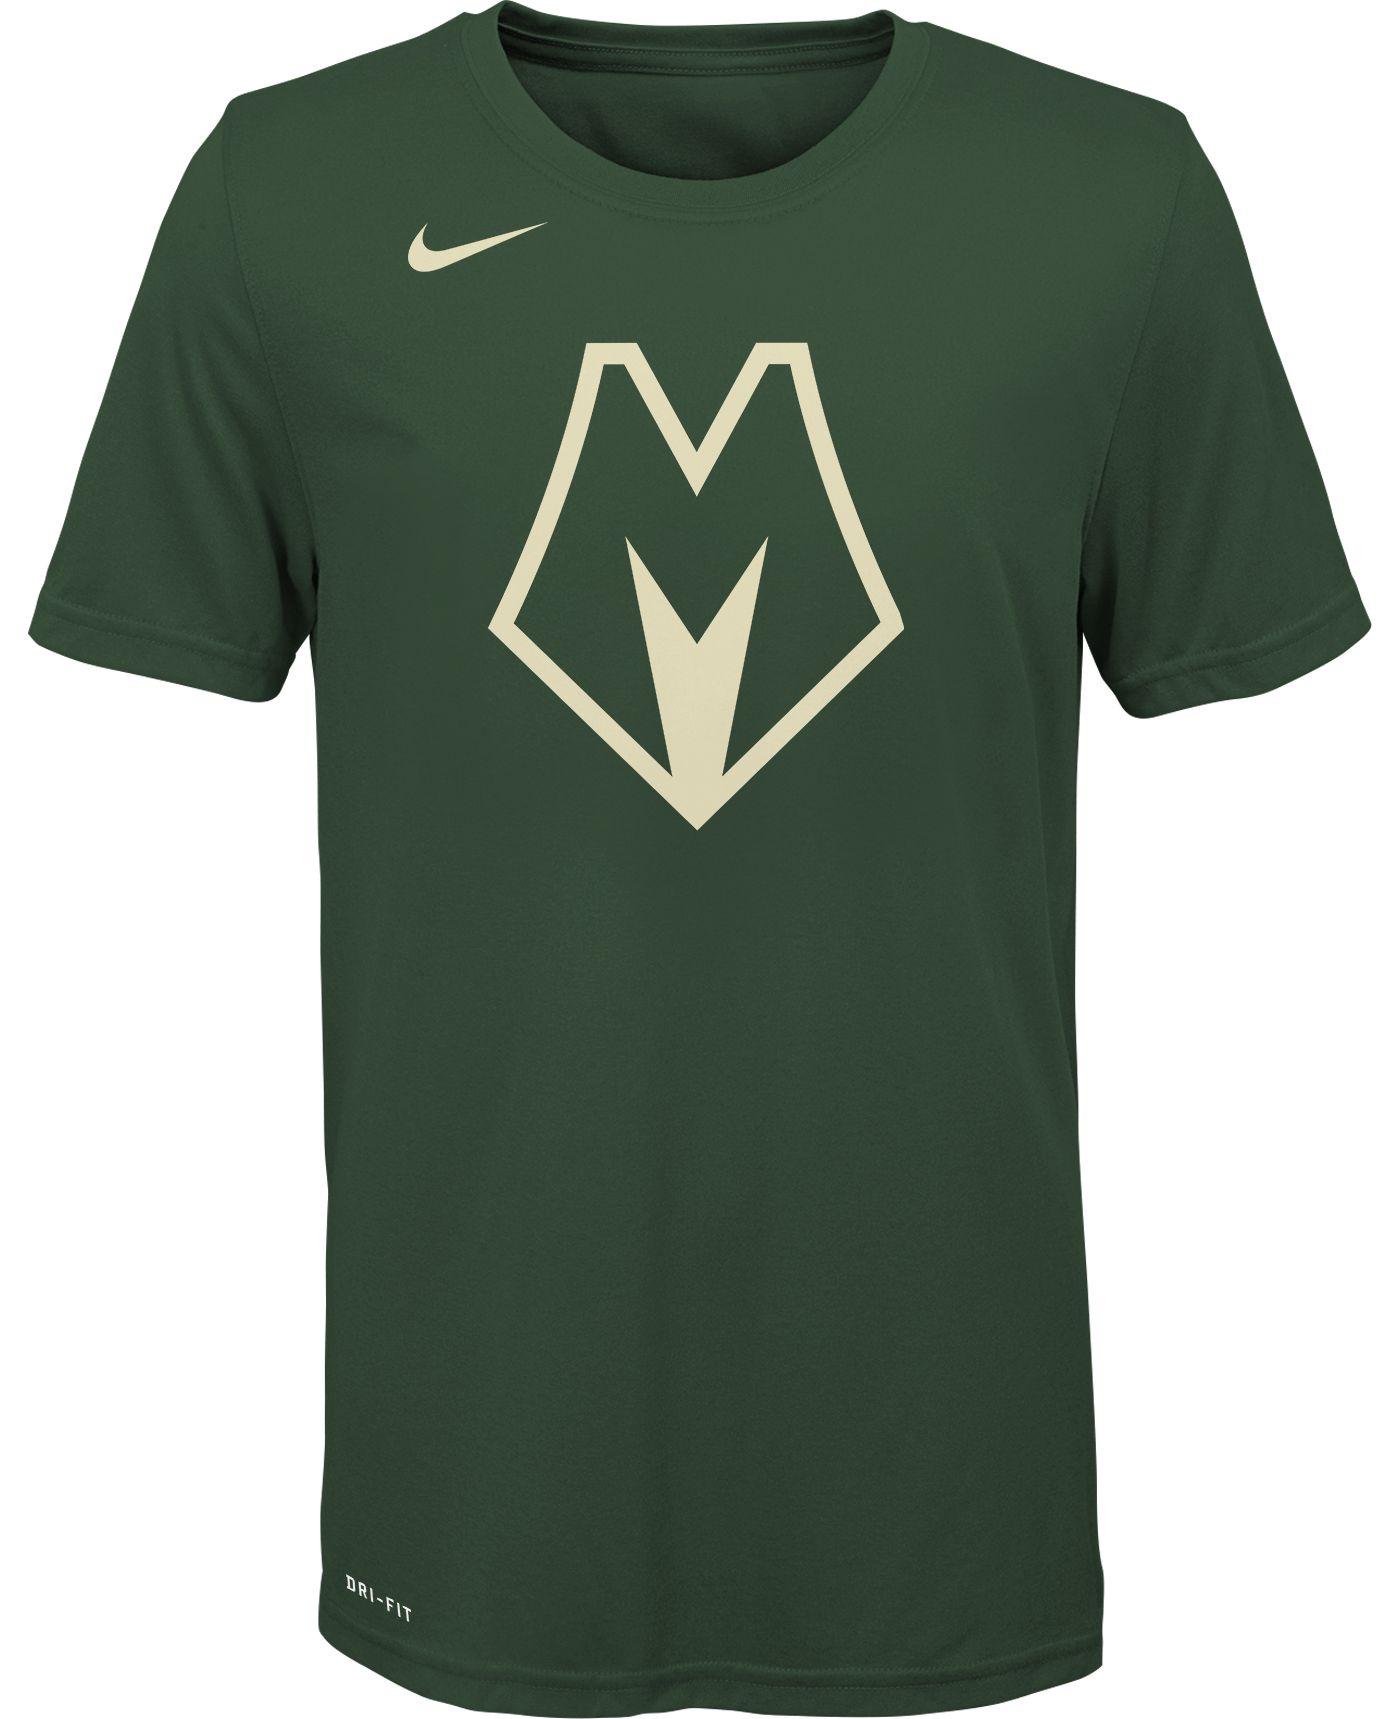 Nike Youth Milwaukee Bucks Dri-FIT Green City Edition T-Shirt